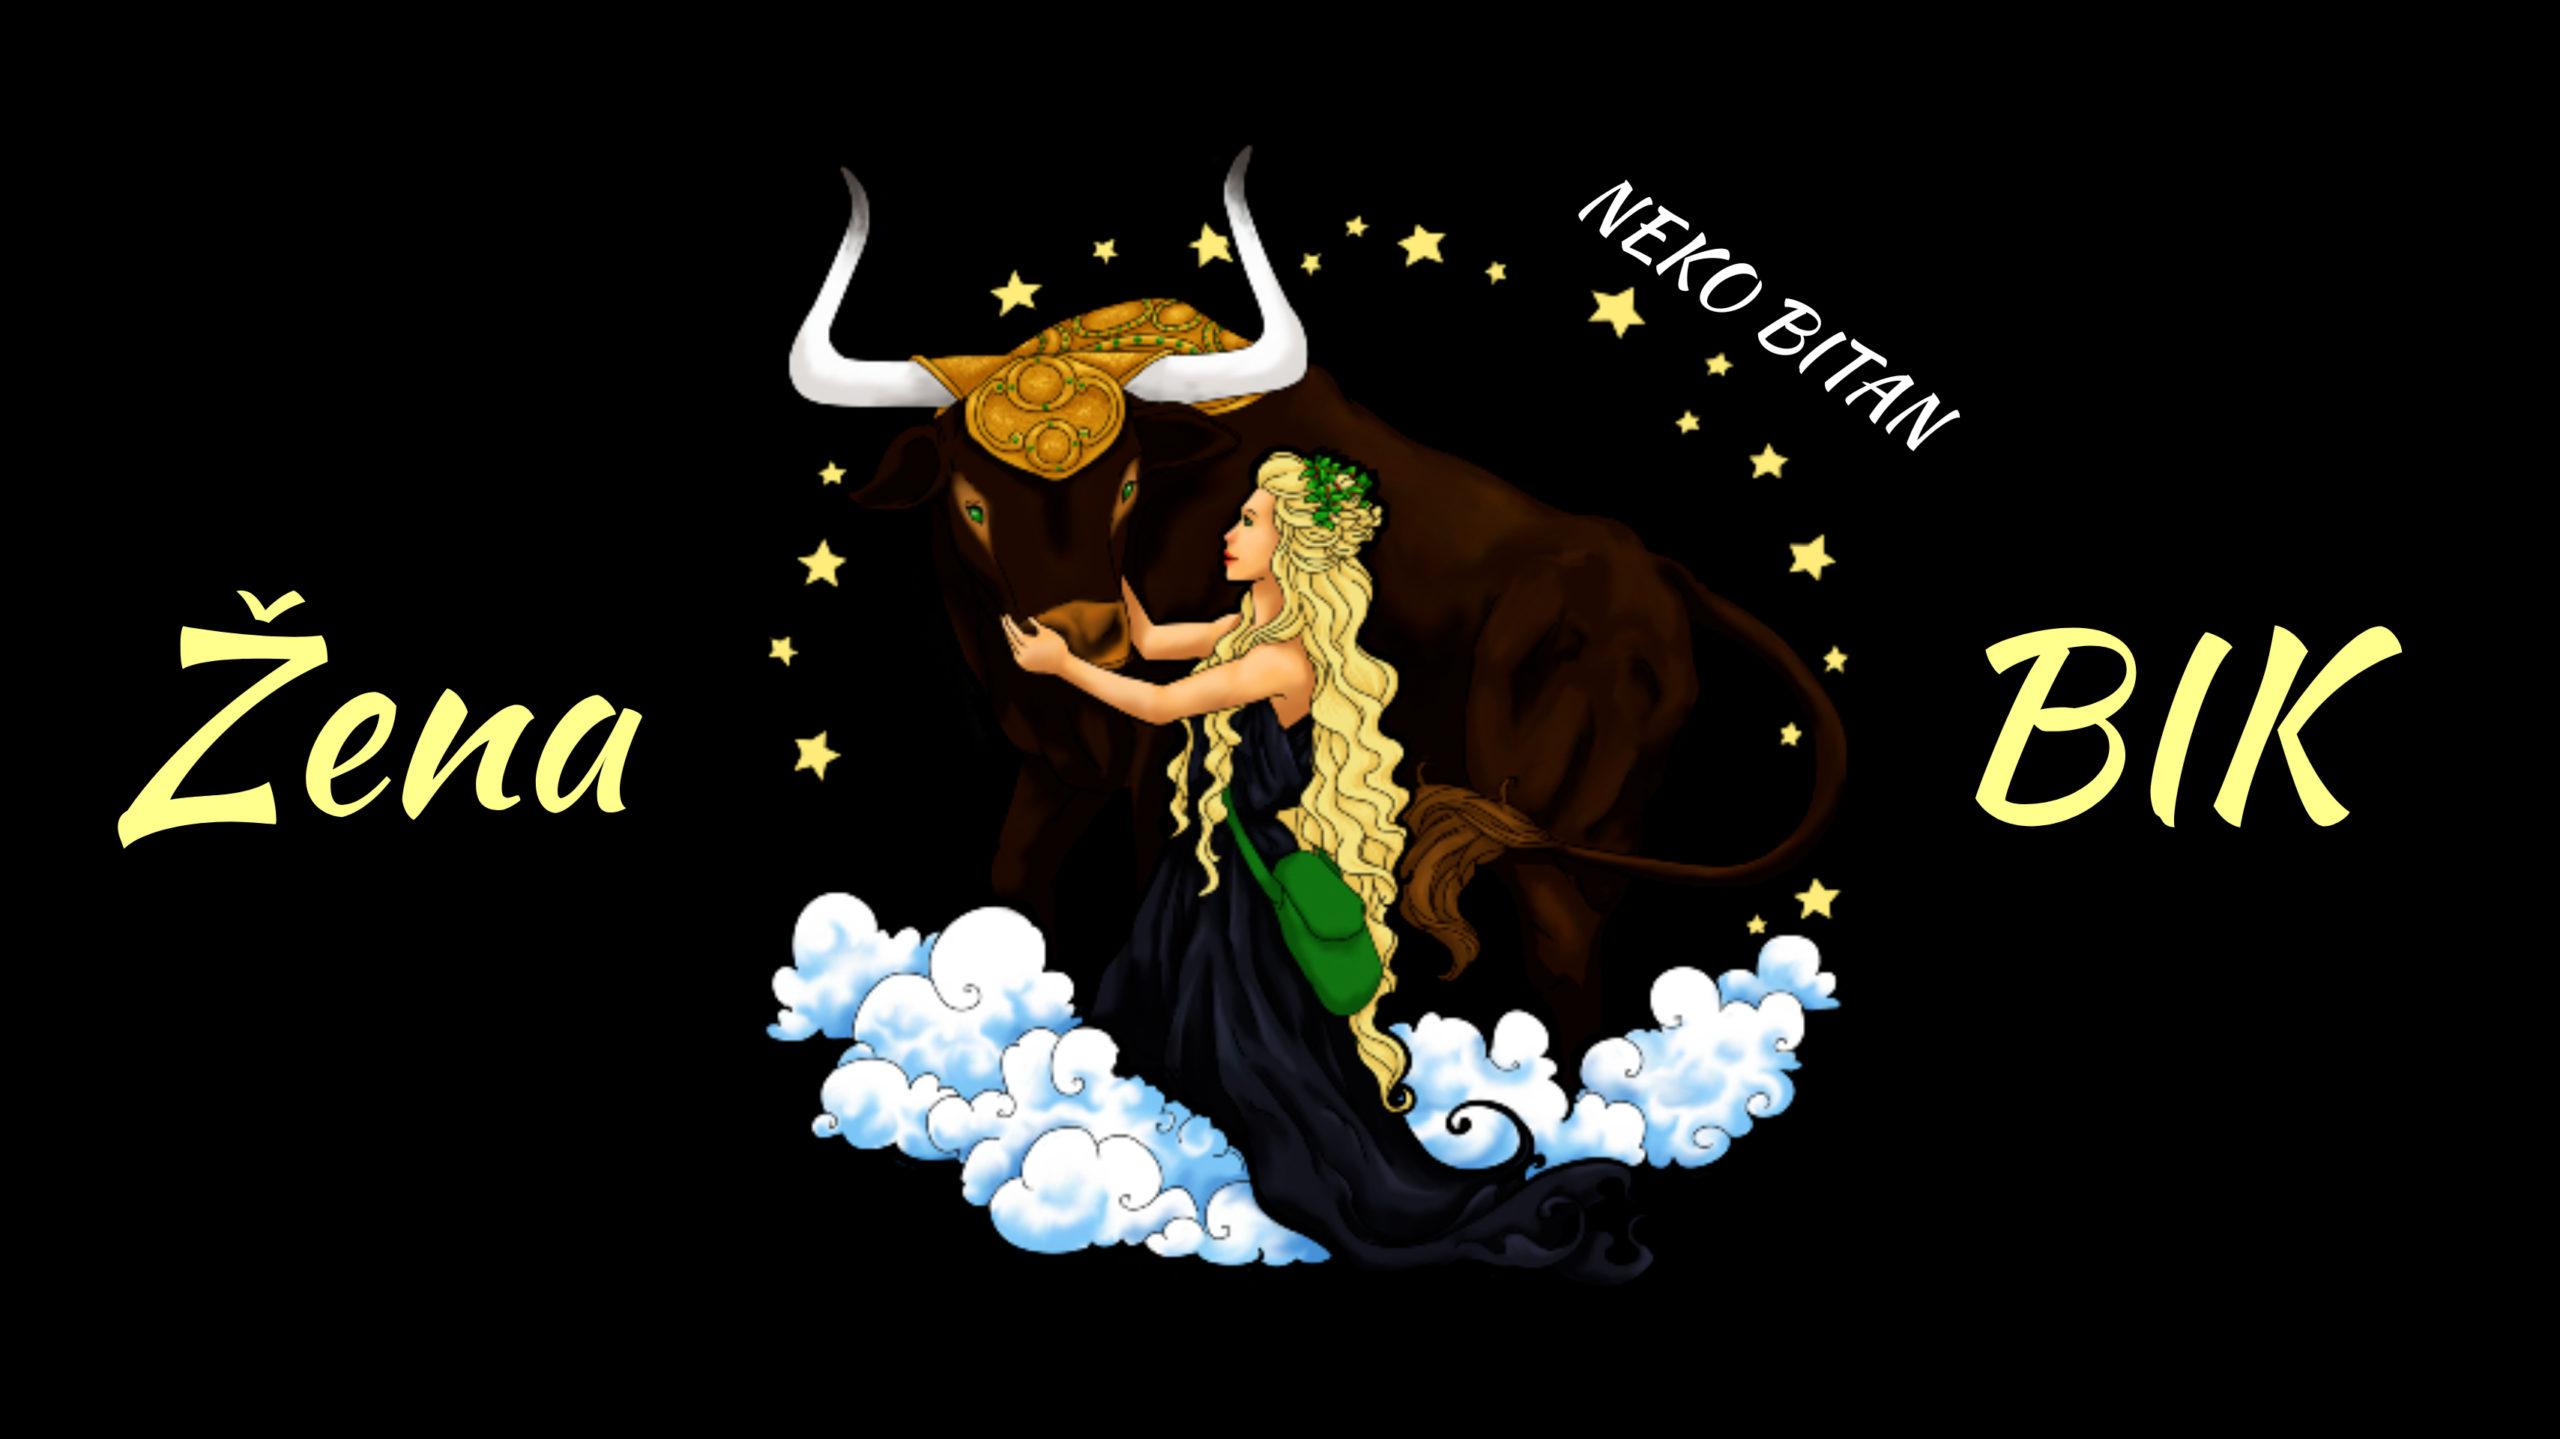 Uporna, dosledna i odlučna žena – ŽENA BIK je tvrdoglava ali najpravednija žena zodijaka!